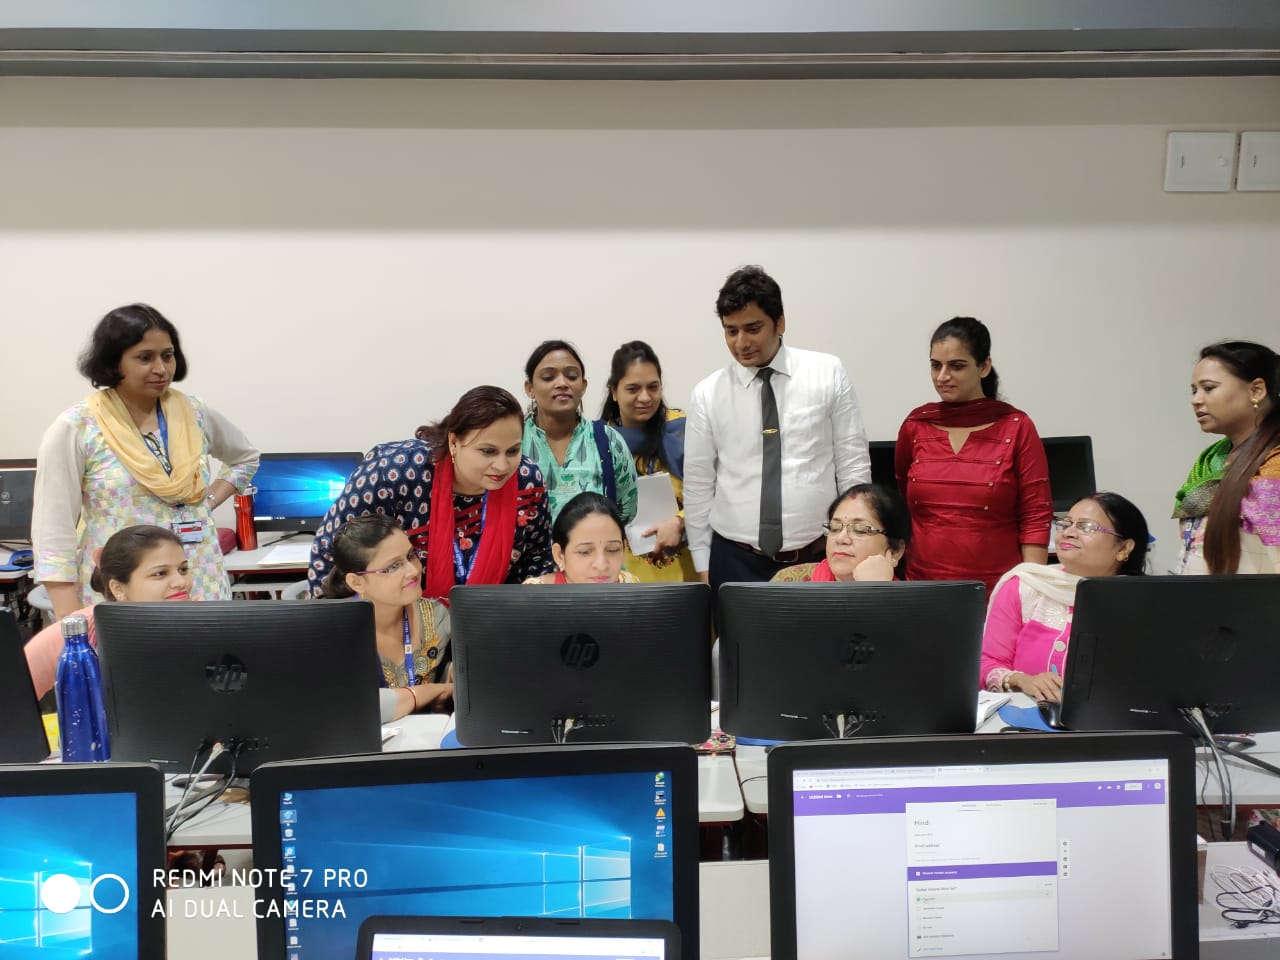 Hindi Workshop at Indus Valley School